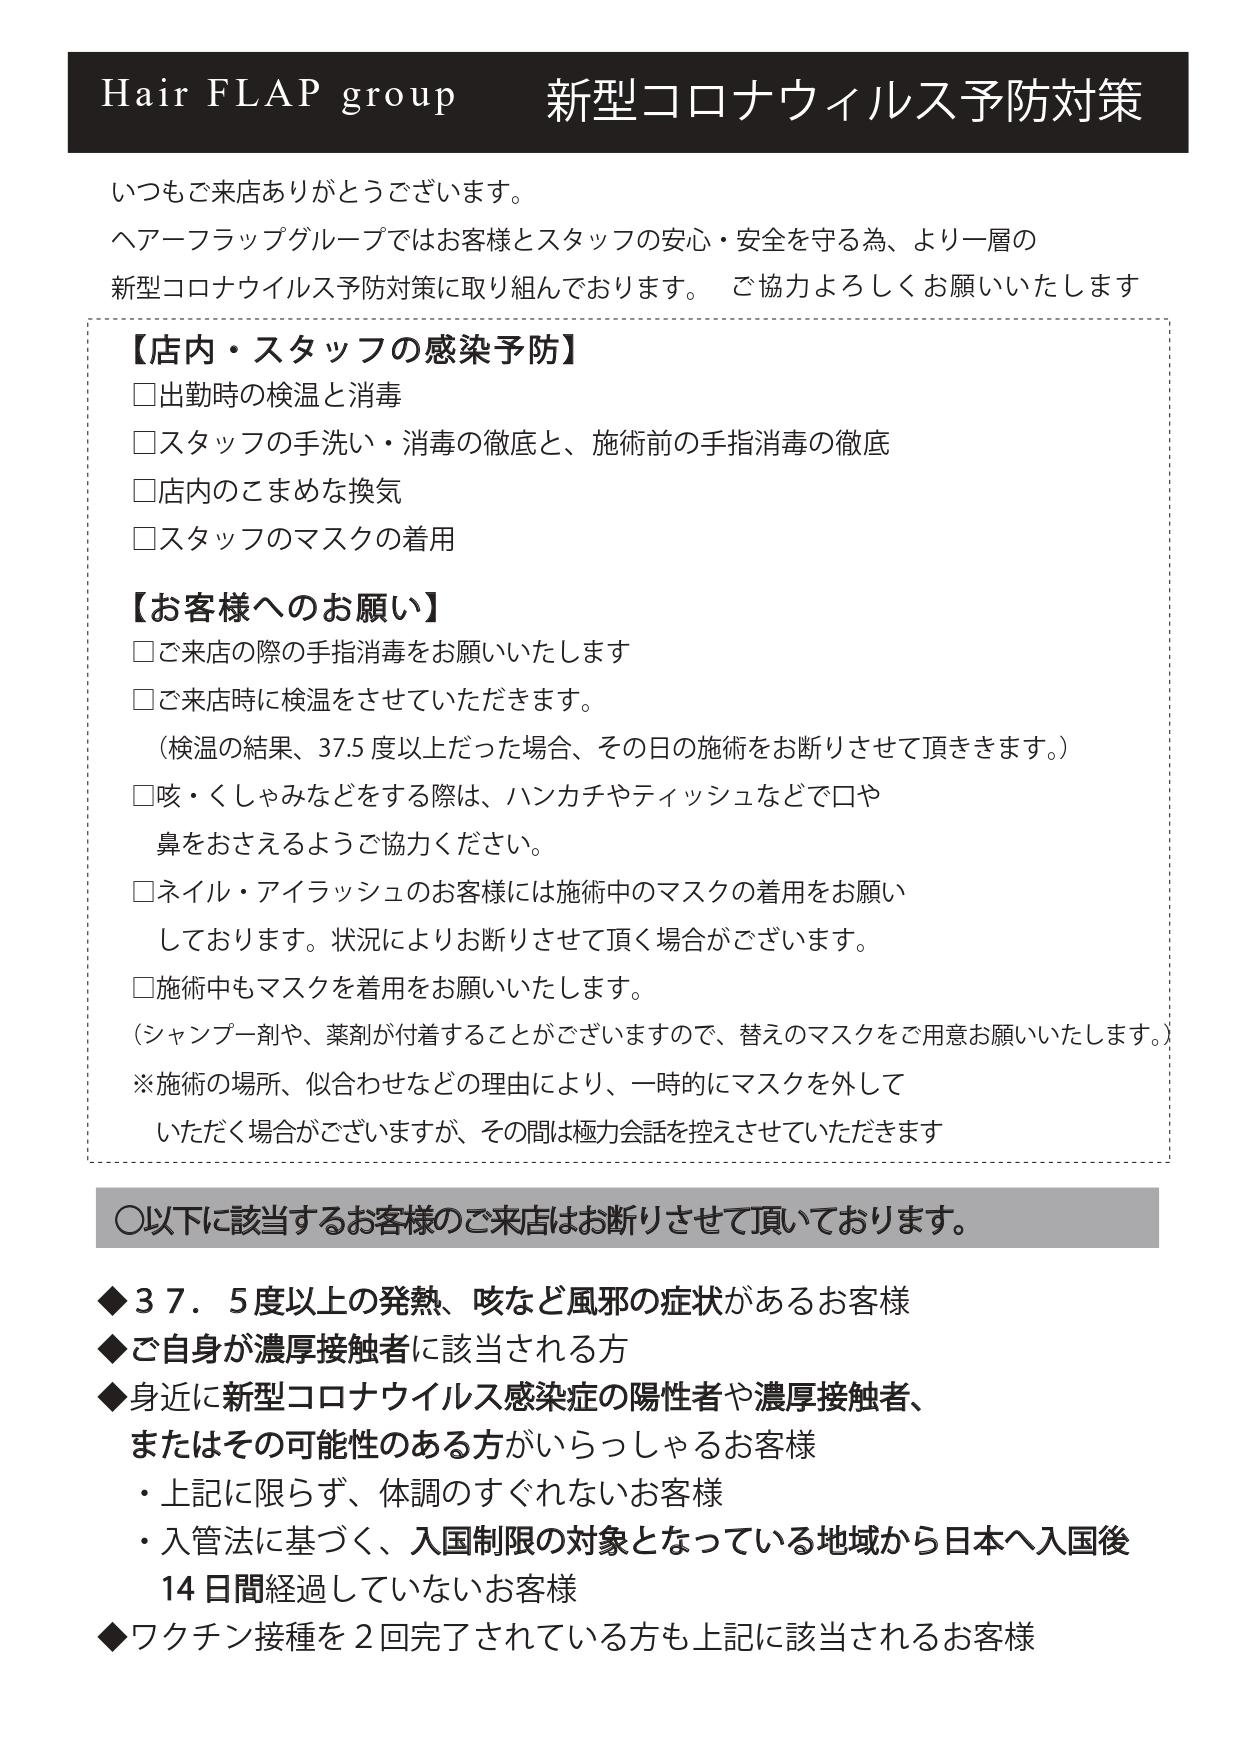 早瀬様_20210830_page-0001